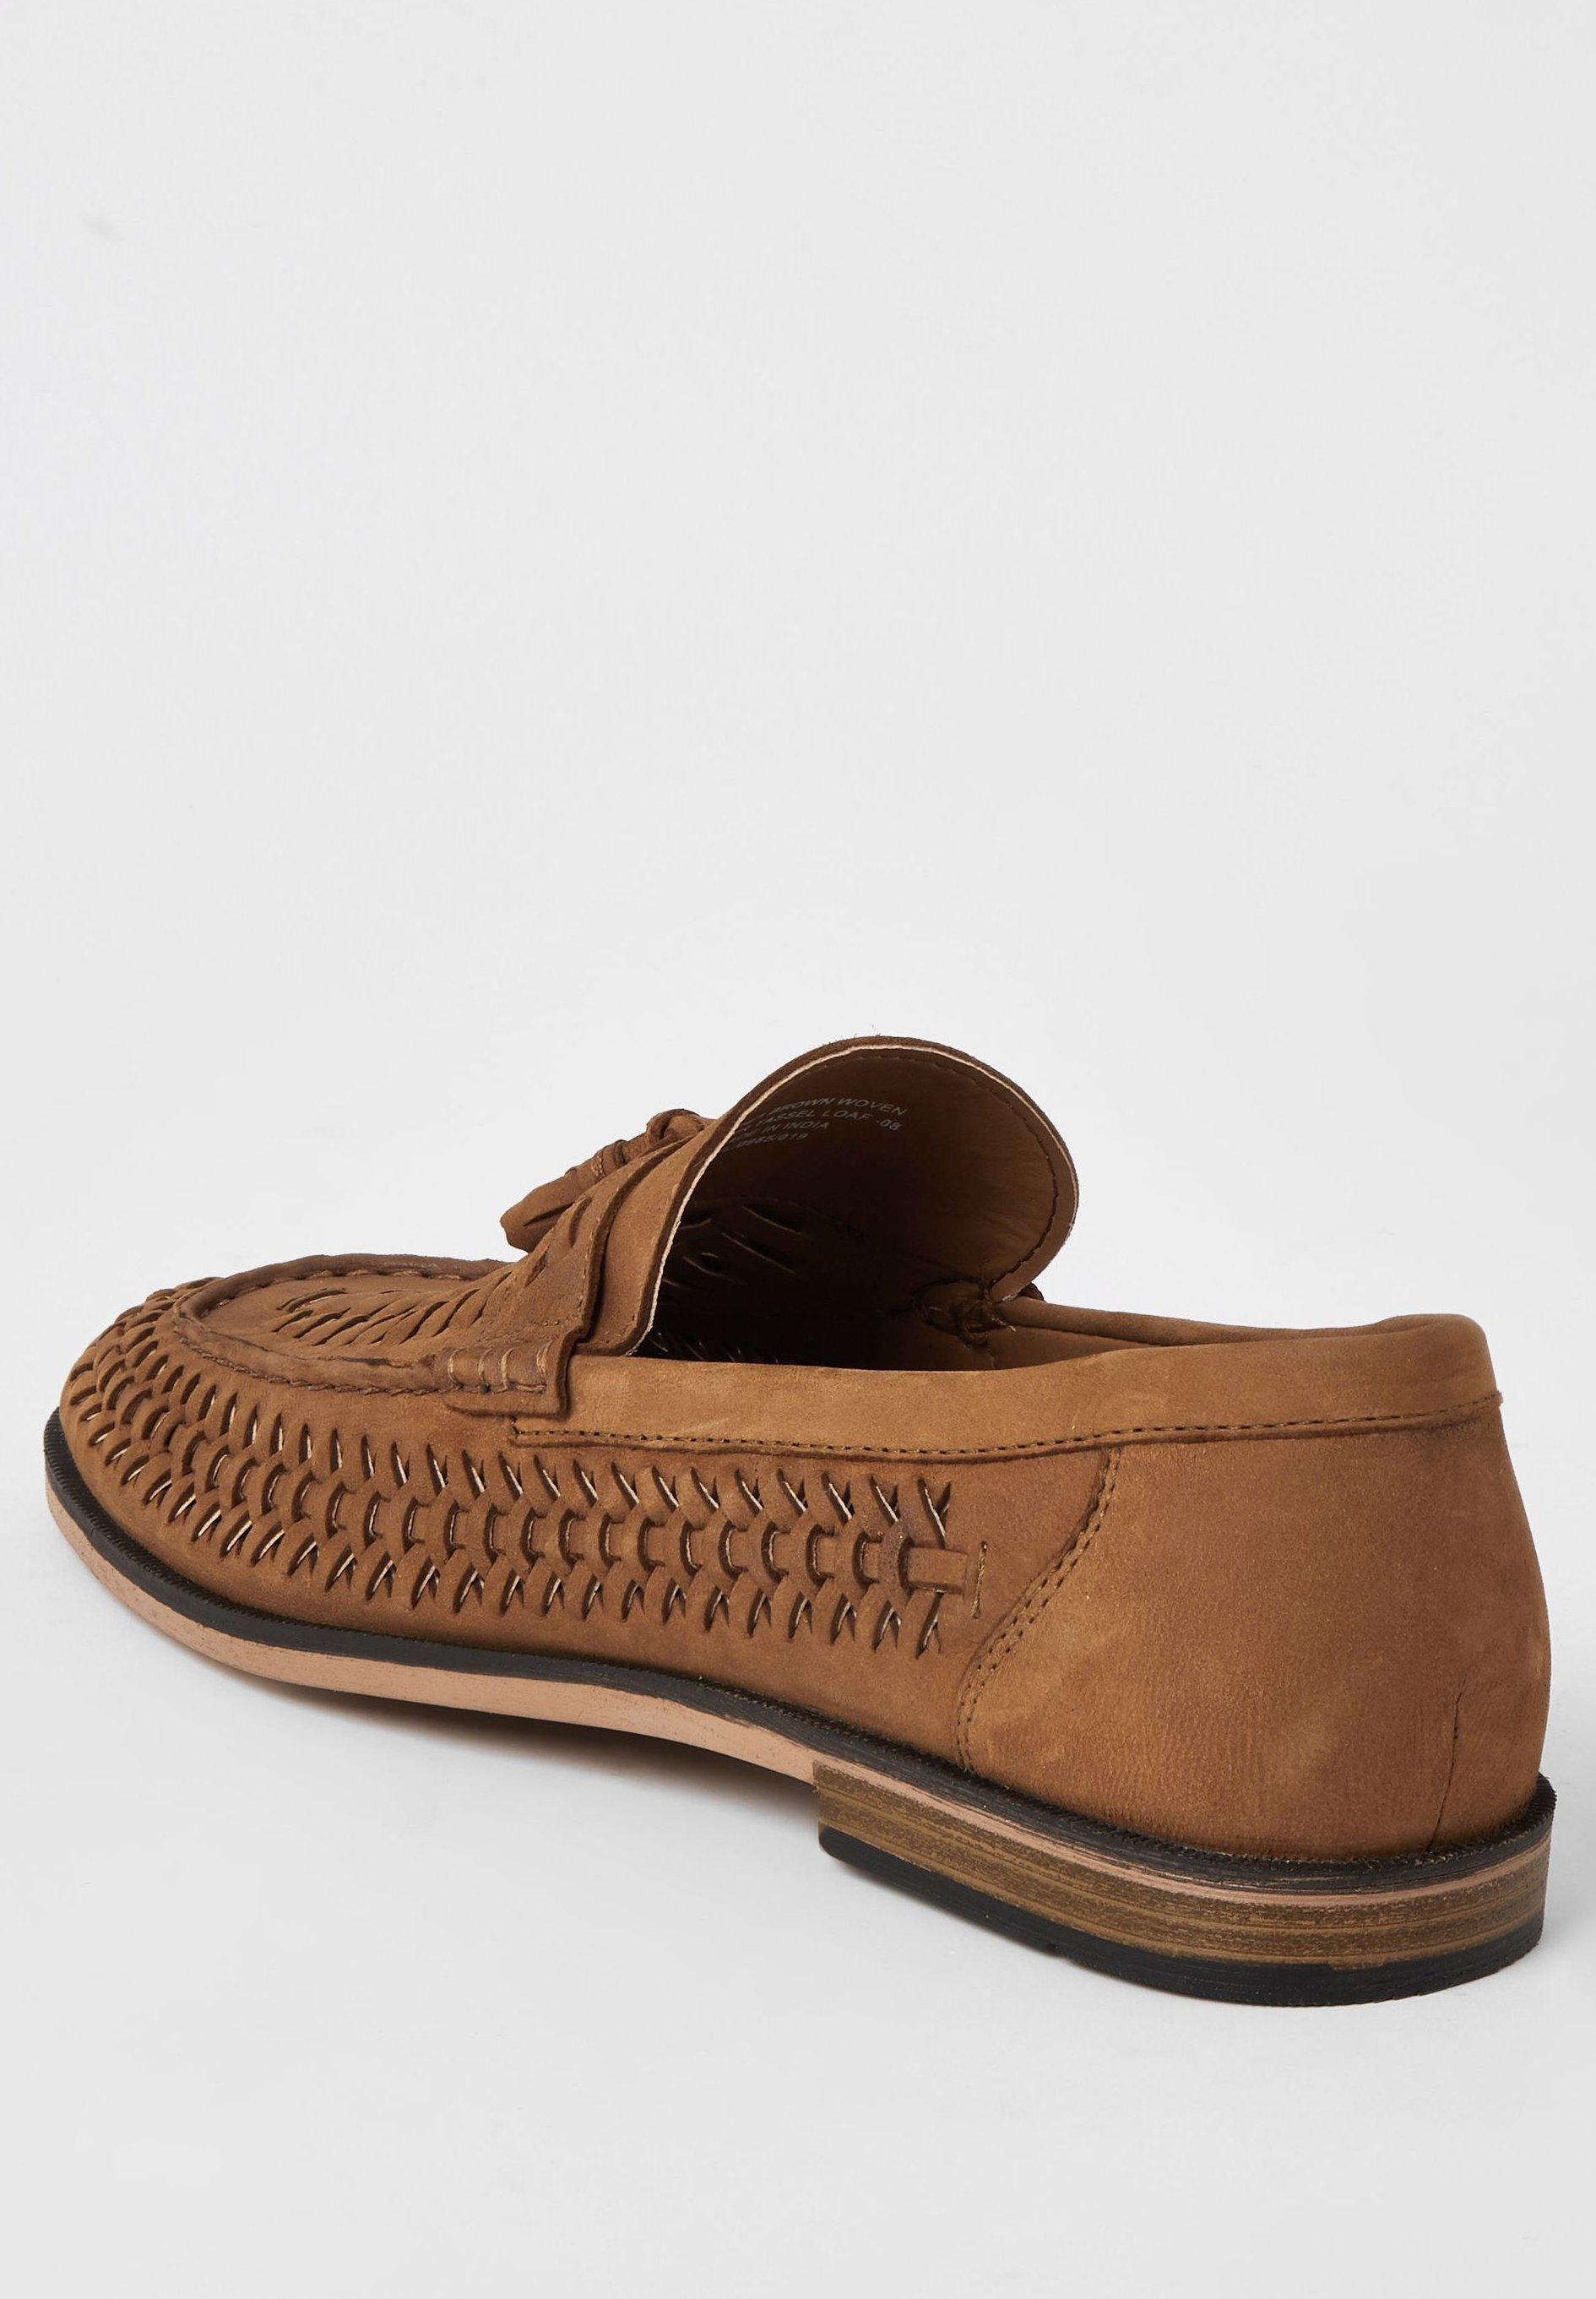 River Island Slip-ins - brown/brun - Herrskor ClhiT